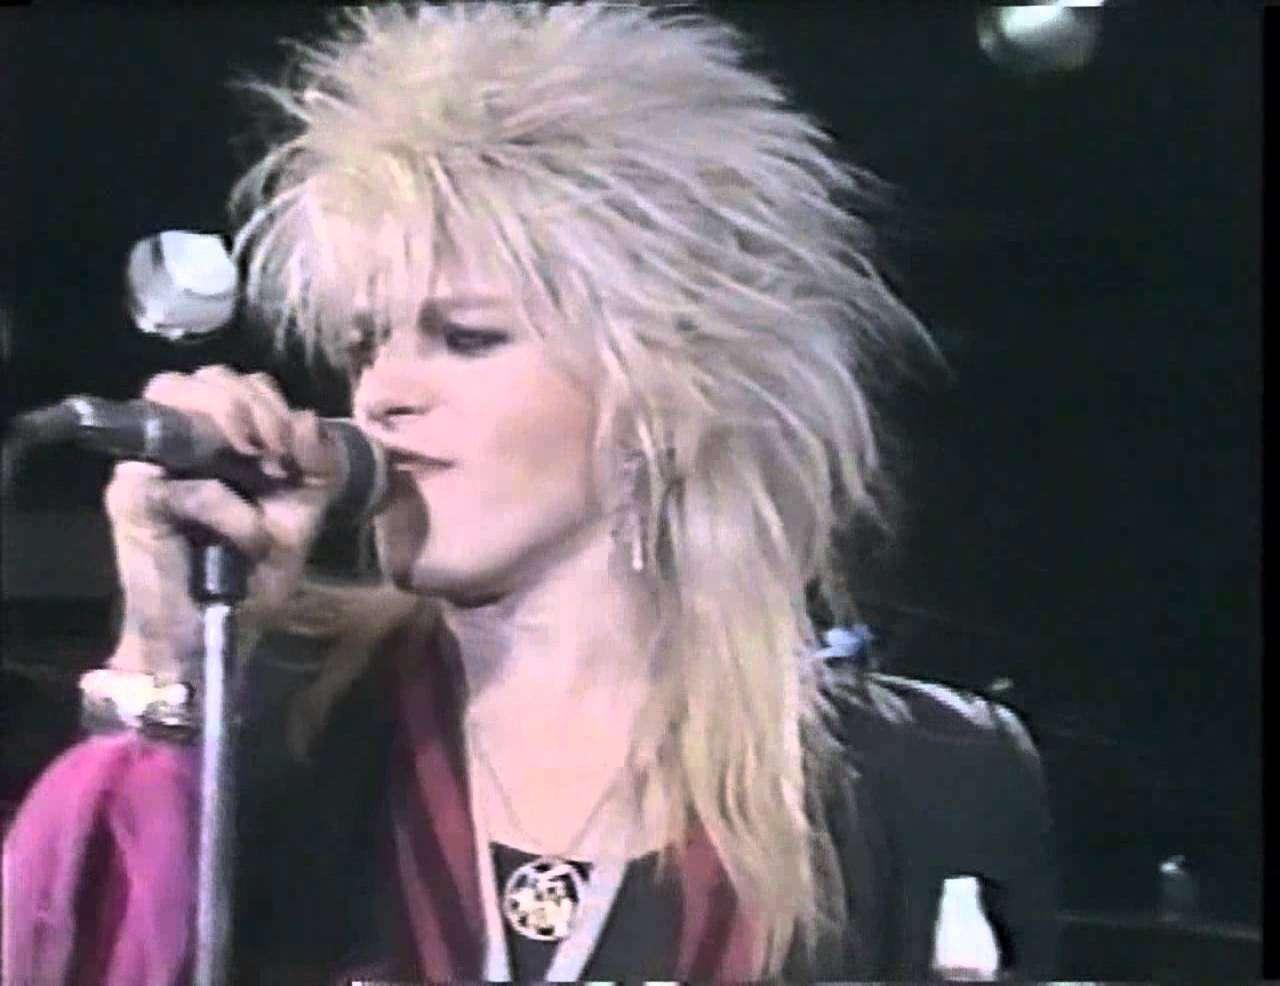 Hanoi Rocks - Oriental Beat (live Marquee Club 1983) HD - YouTube